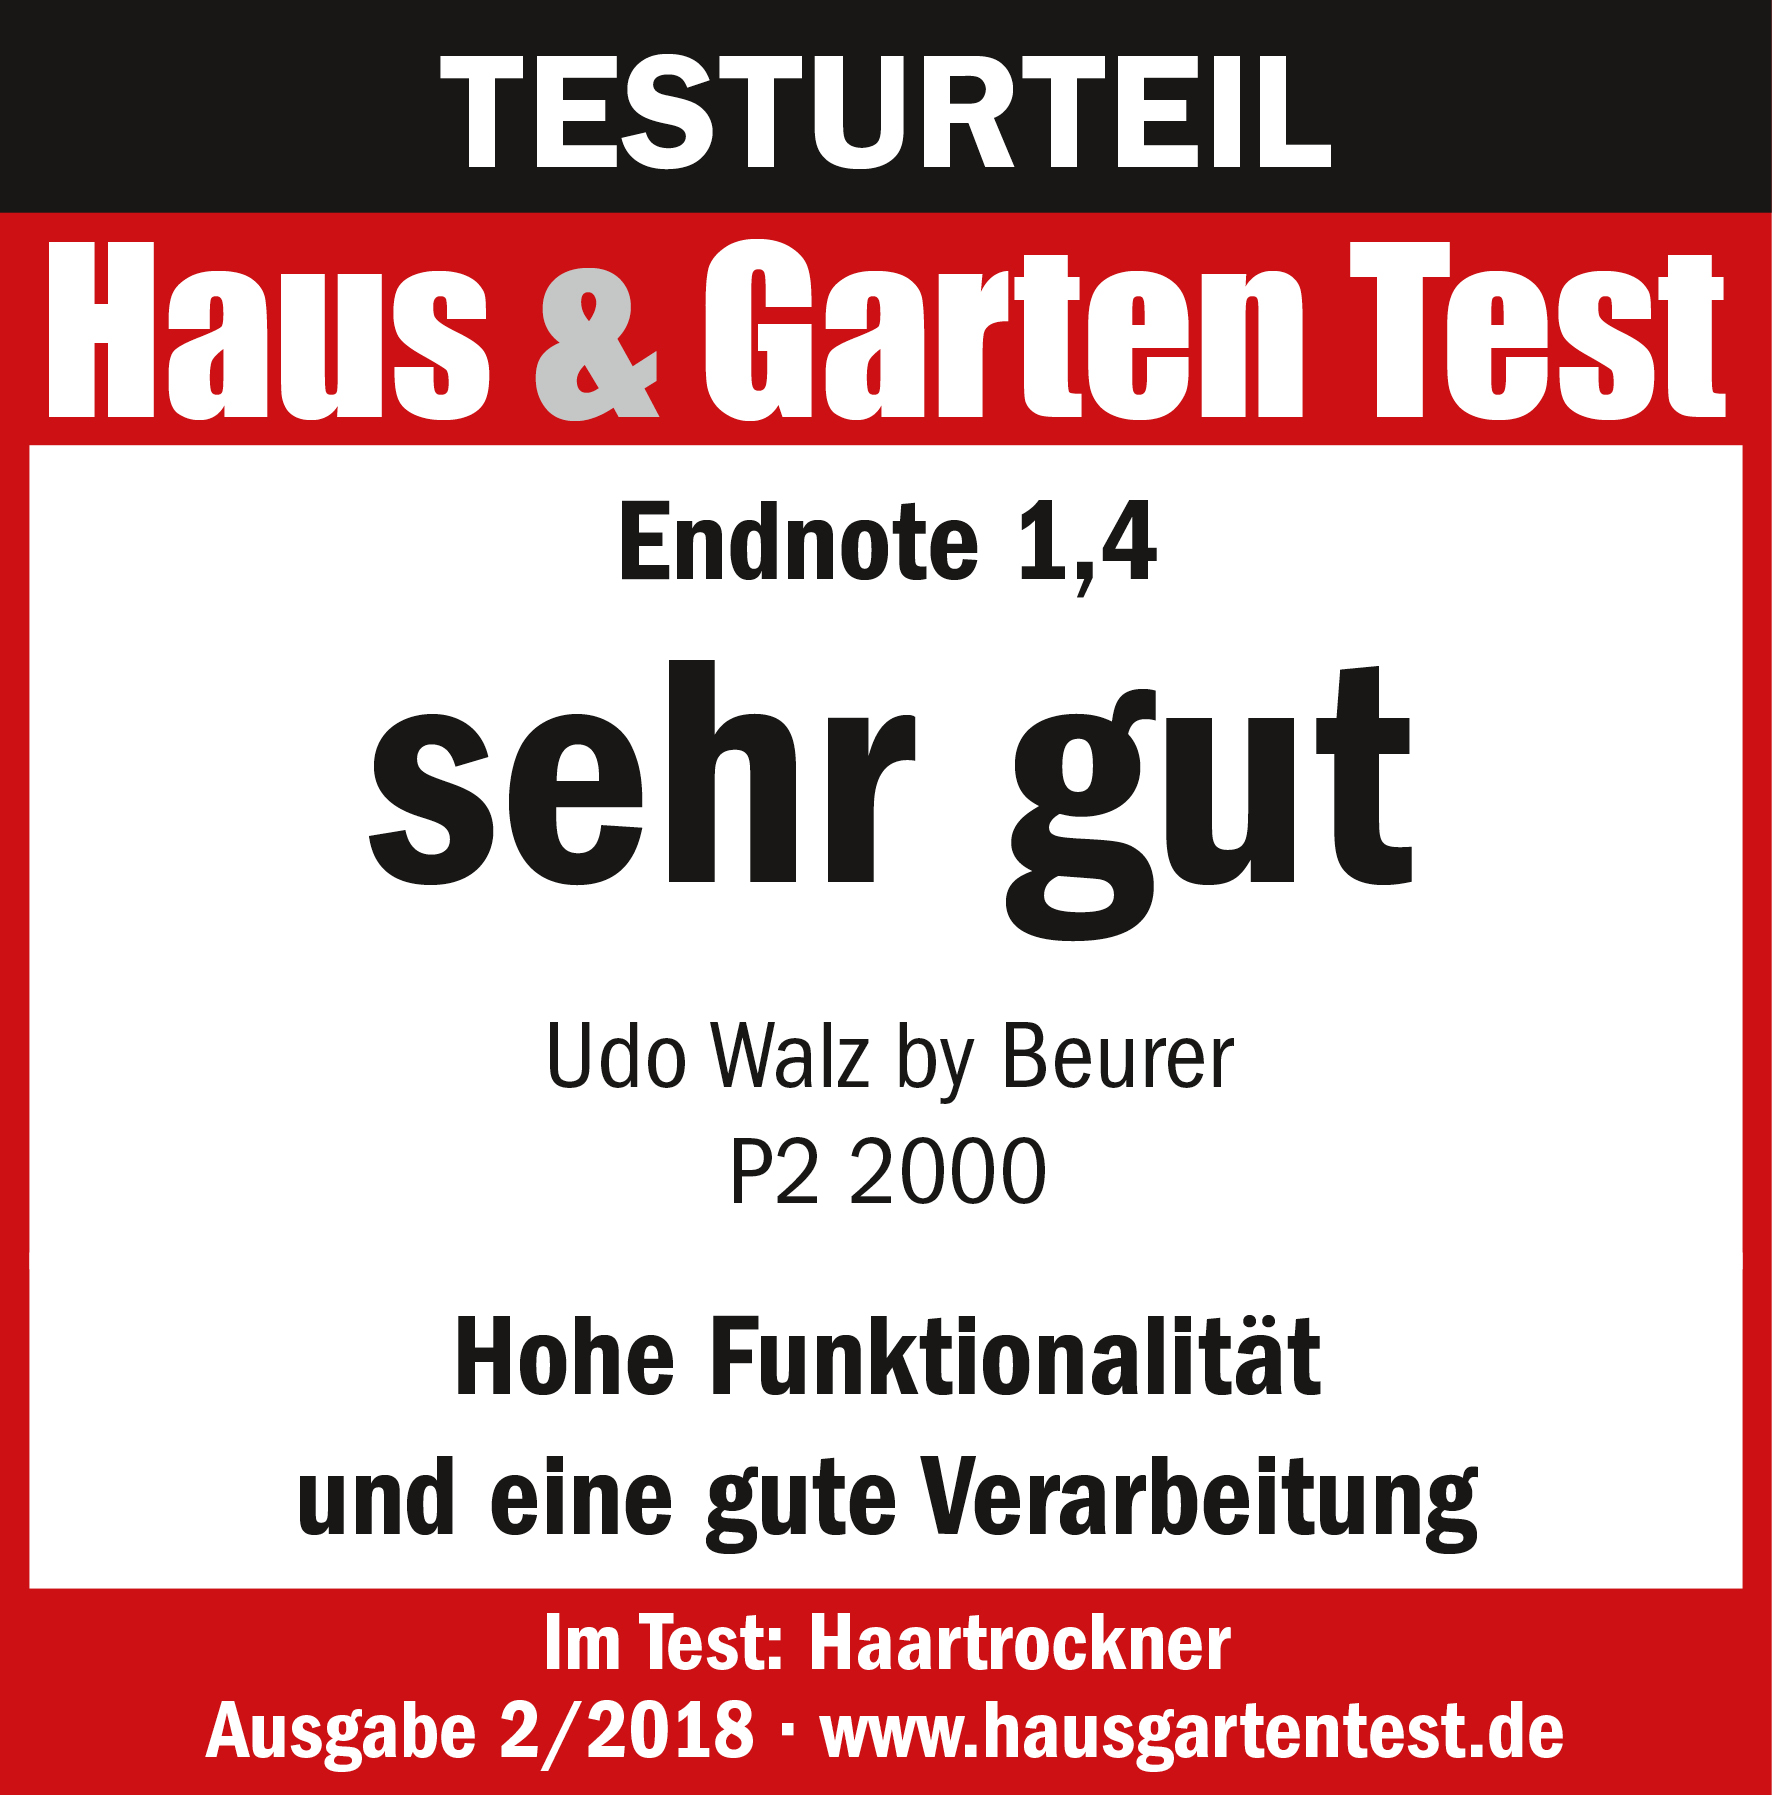 https://www.beurer-shop.de/media/images/attributevalueimages/p2-2000_haus-garten_sehrgut_0218.png